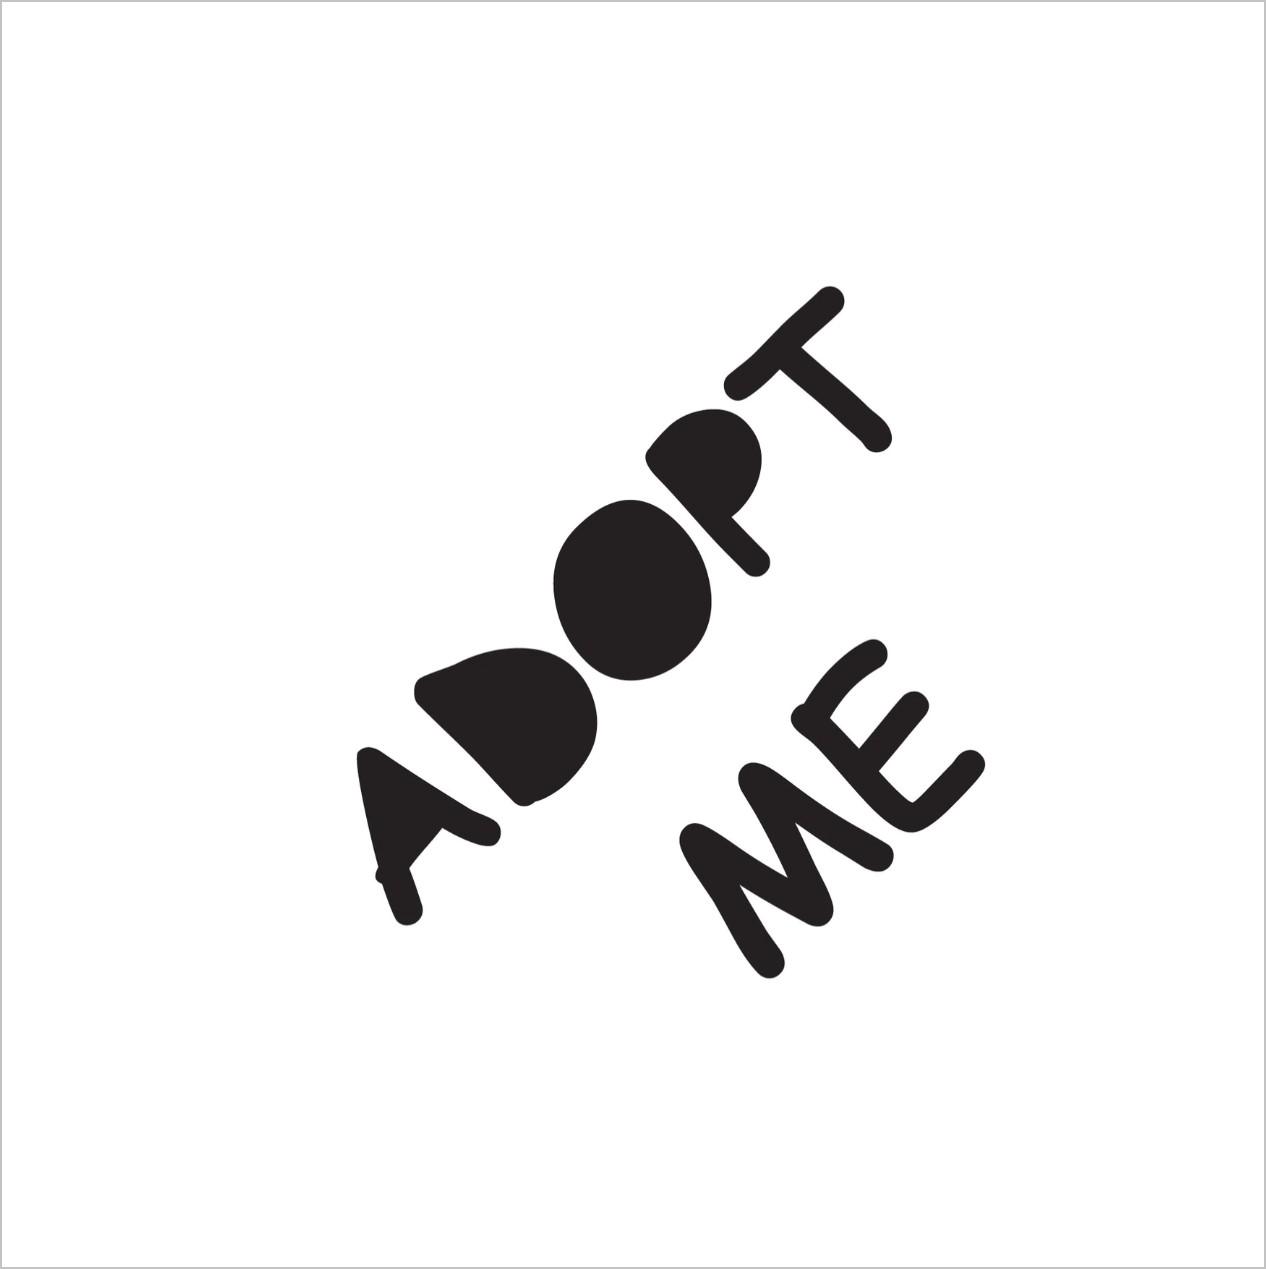 Adopt Me Professional Stencil Insert (small)